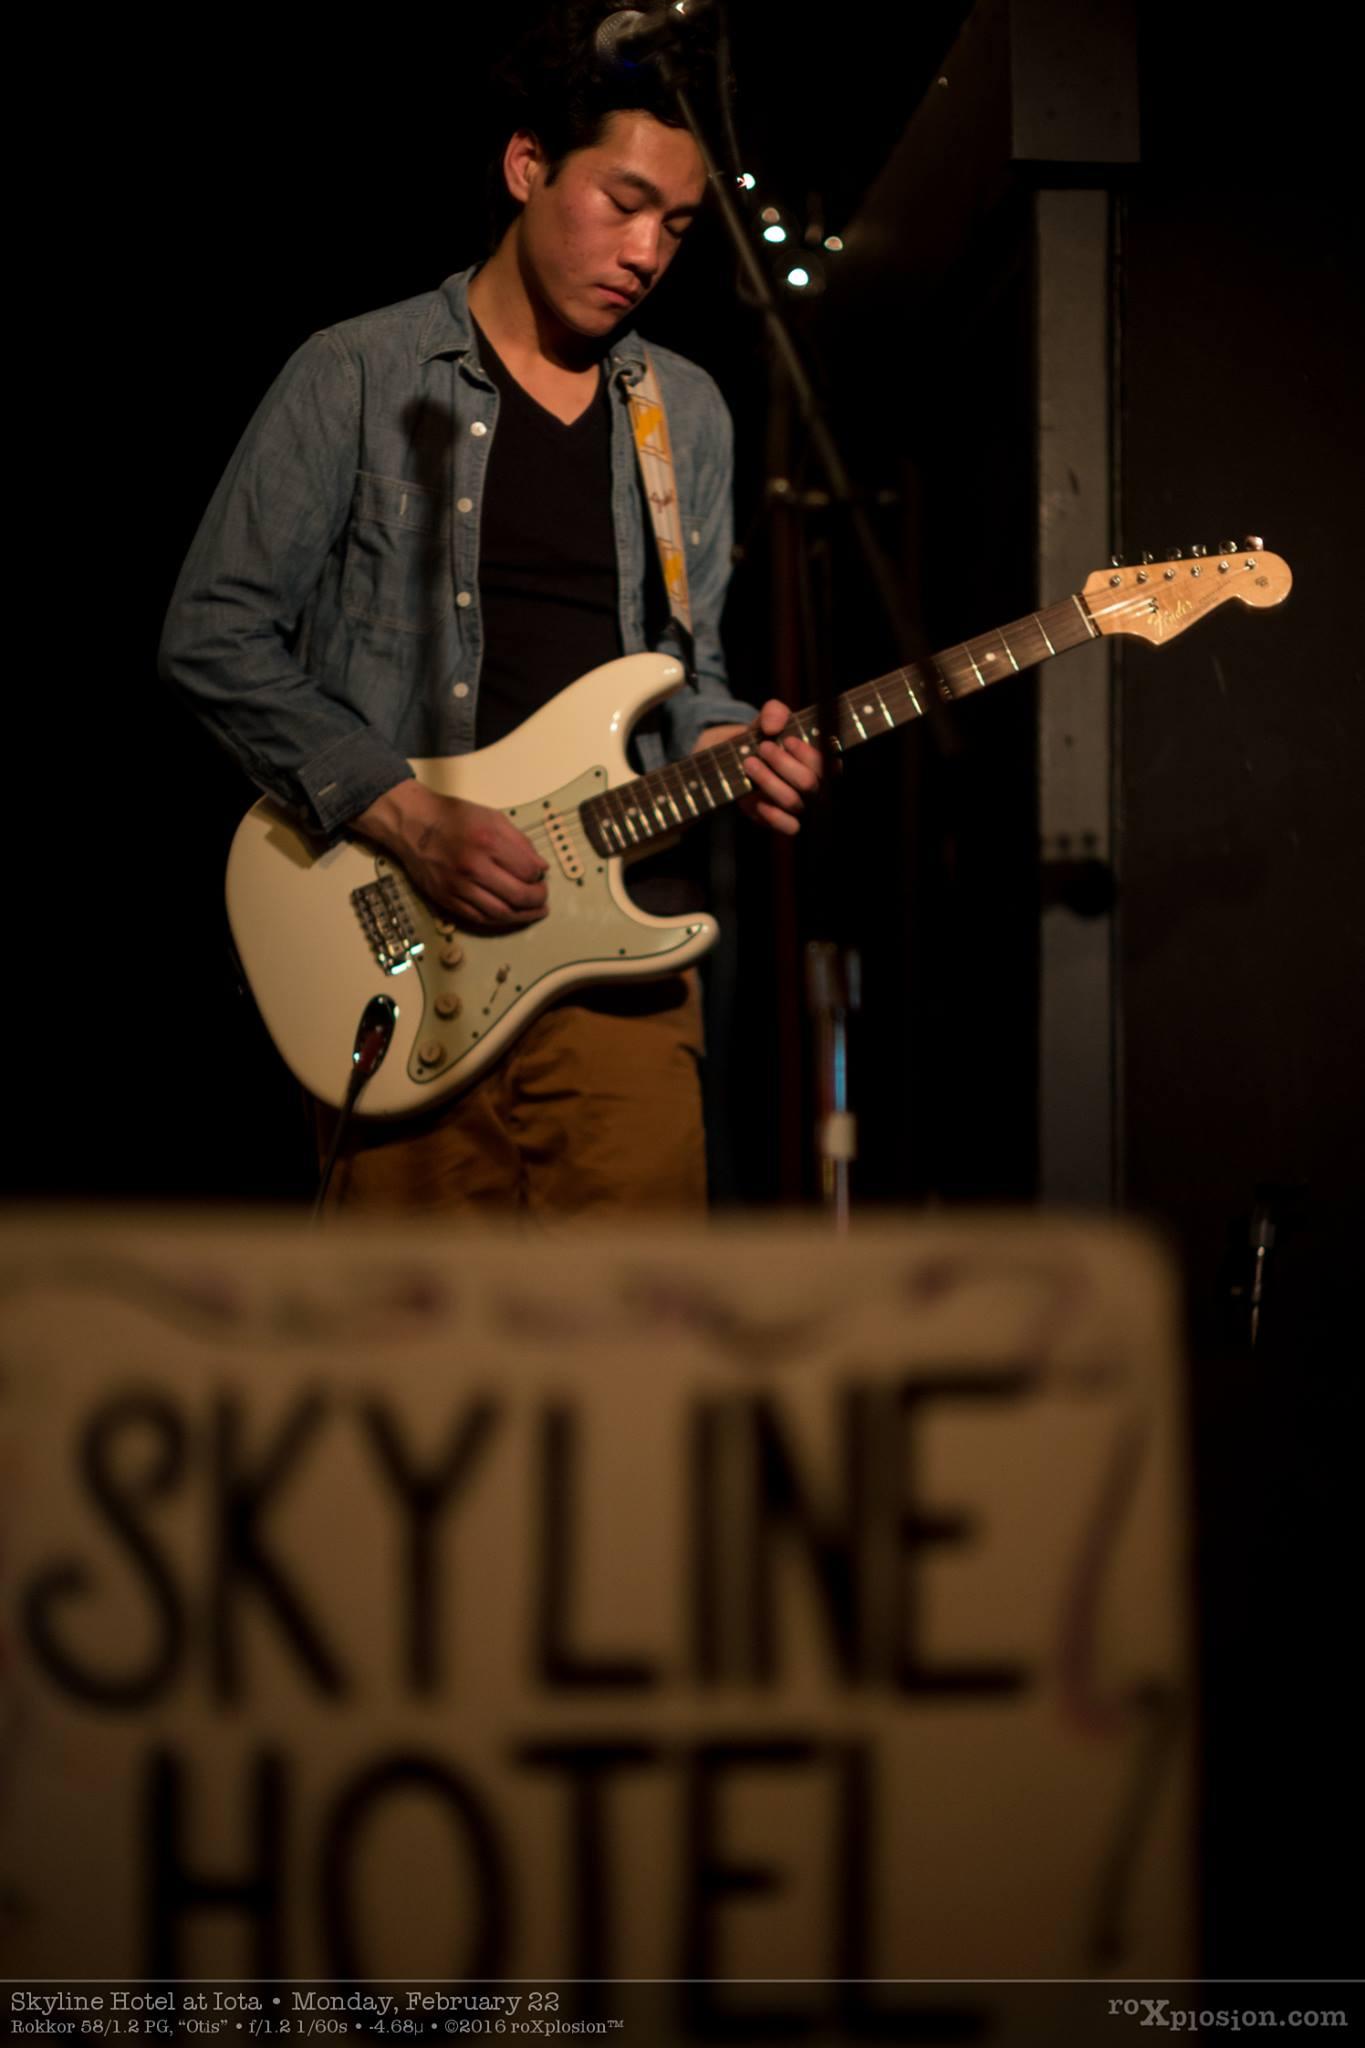 Skyline Hotel - IOTA Club 2-22-16 (17).jpg